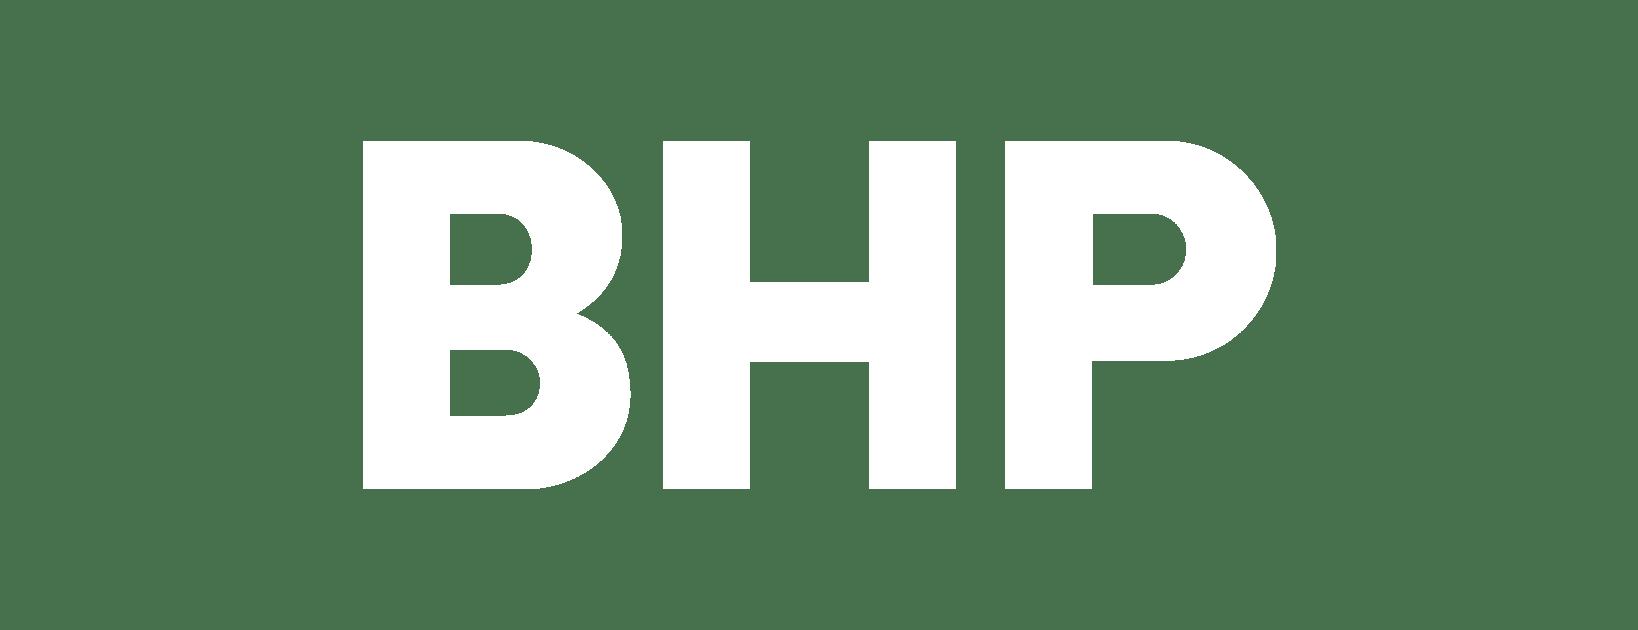 logo_0005_bhp-logo